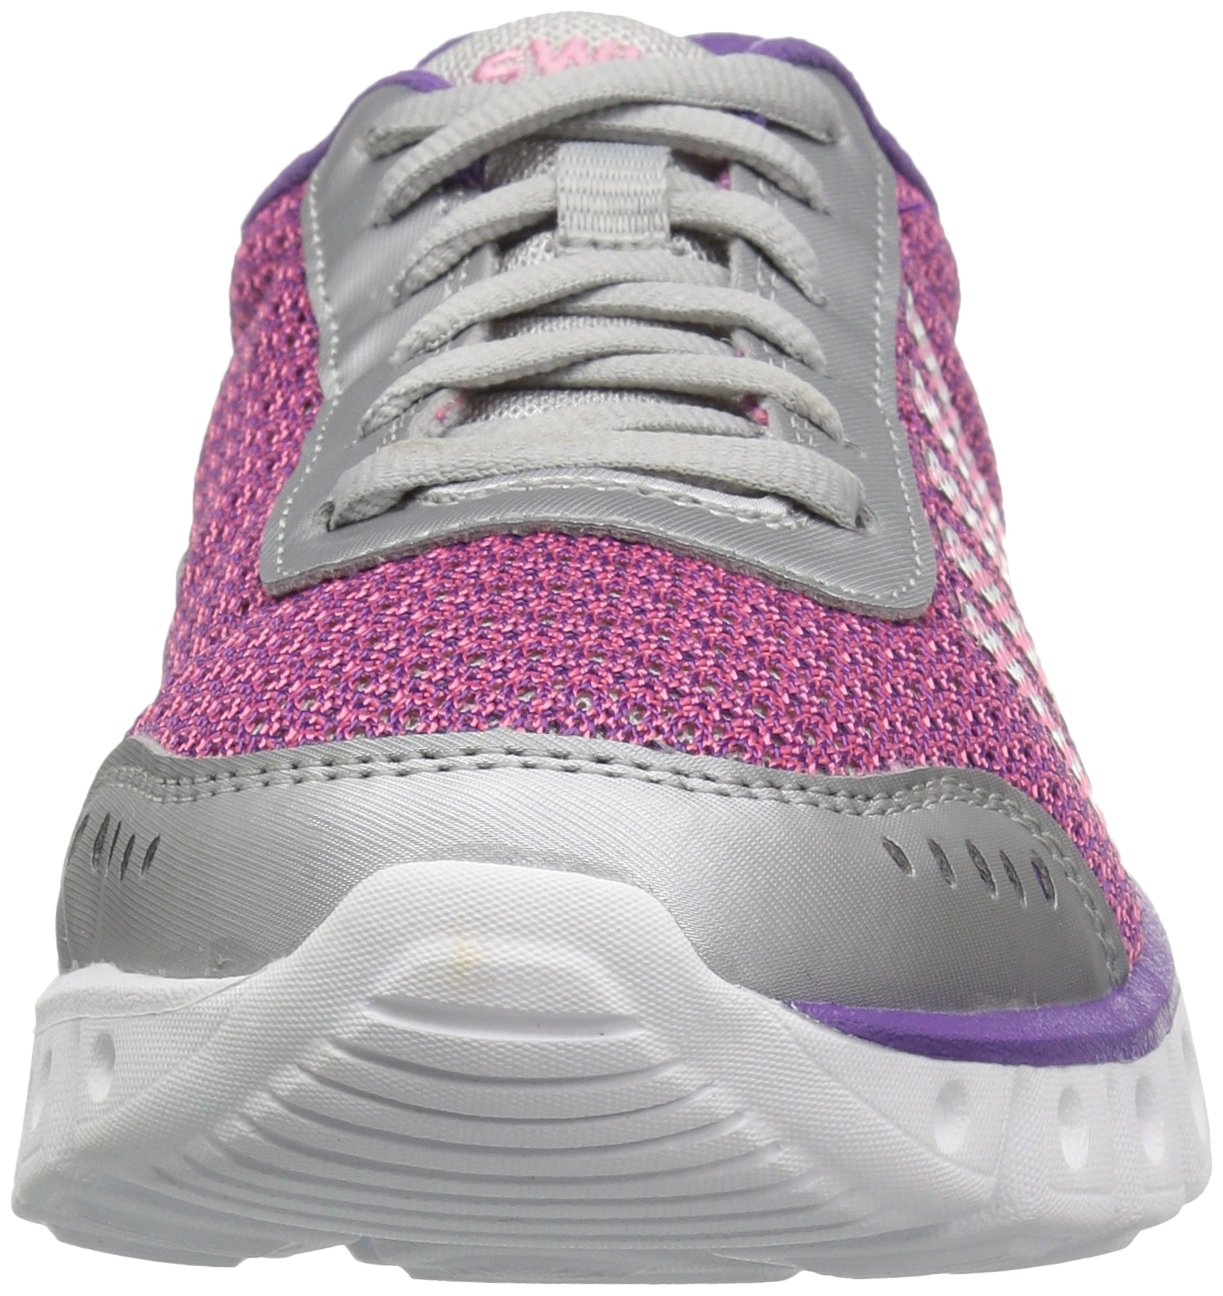 K-schweiziska  Kvinnors Xlite Shoe Athltc HthrCMF-W Cross-Trainer Shoe Hot  Pink Hot  Pansy 83f77e2 - warezindir.club f64bb936f586c